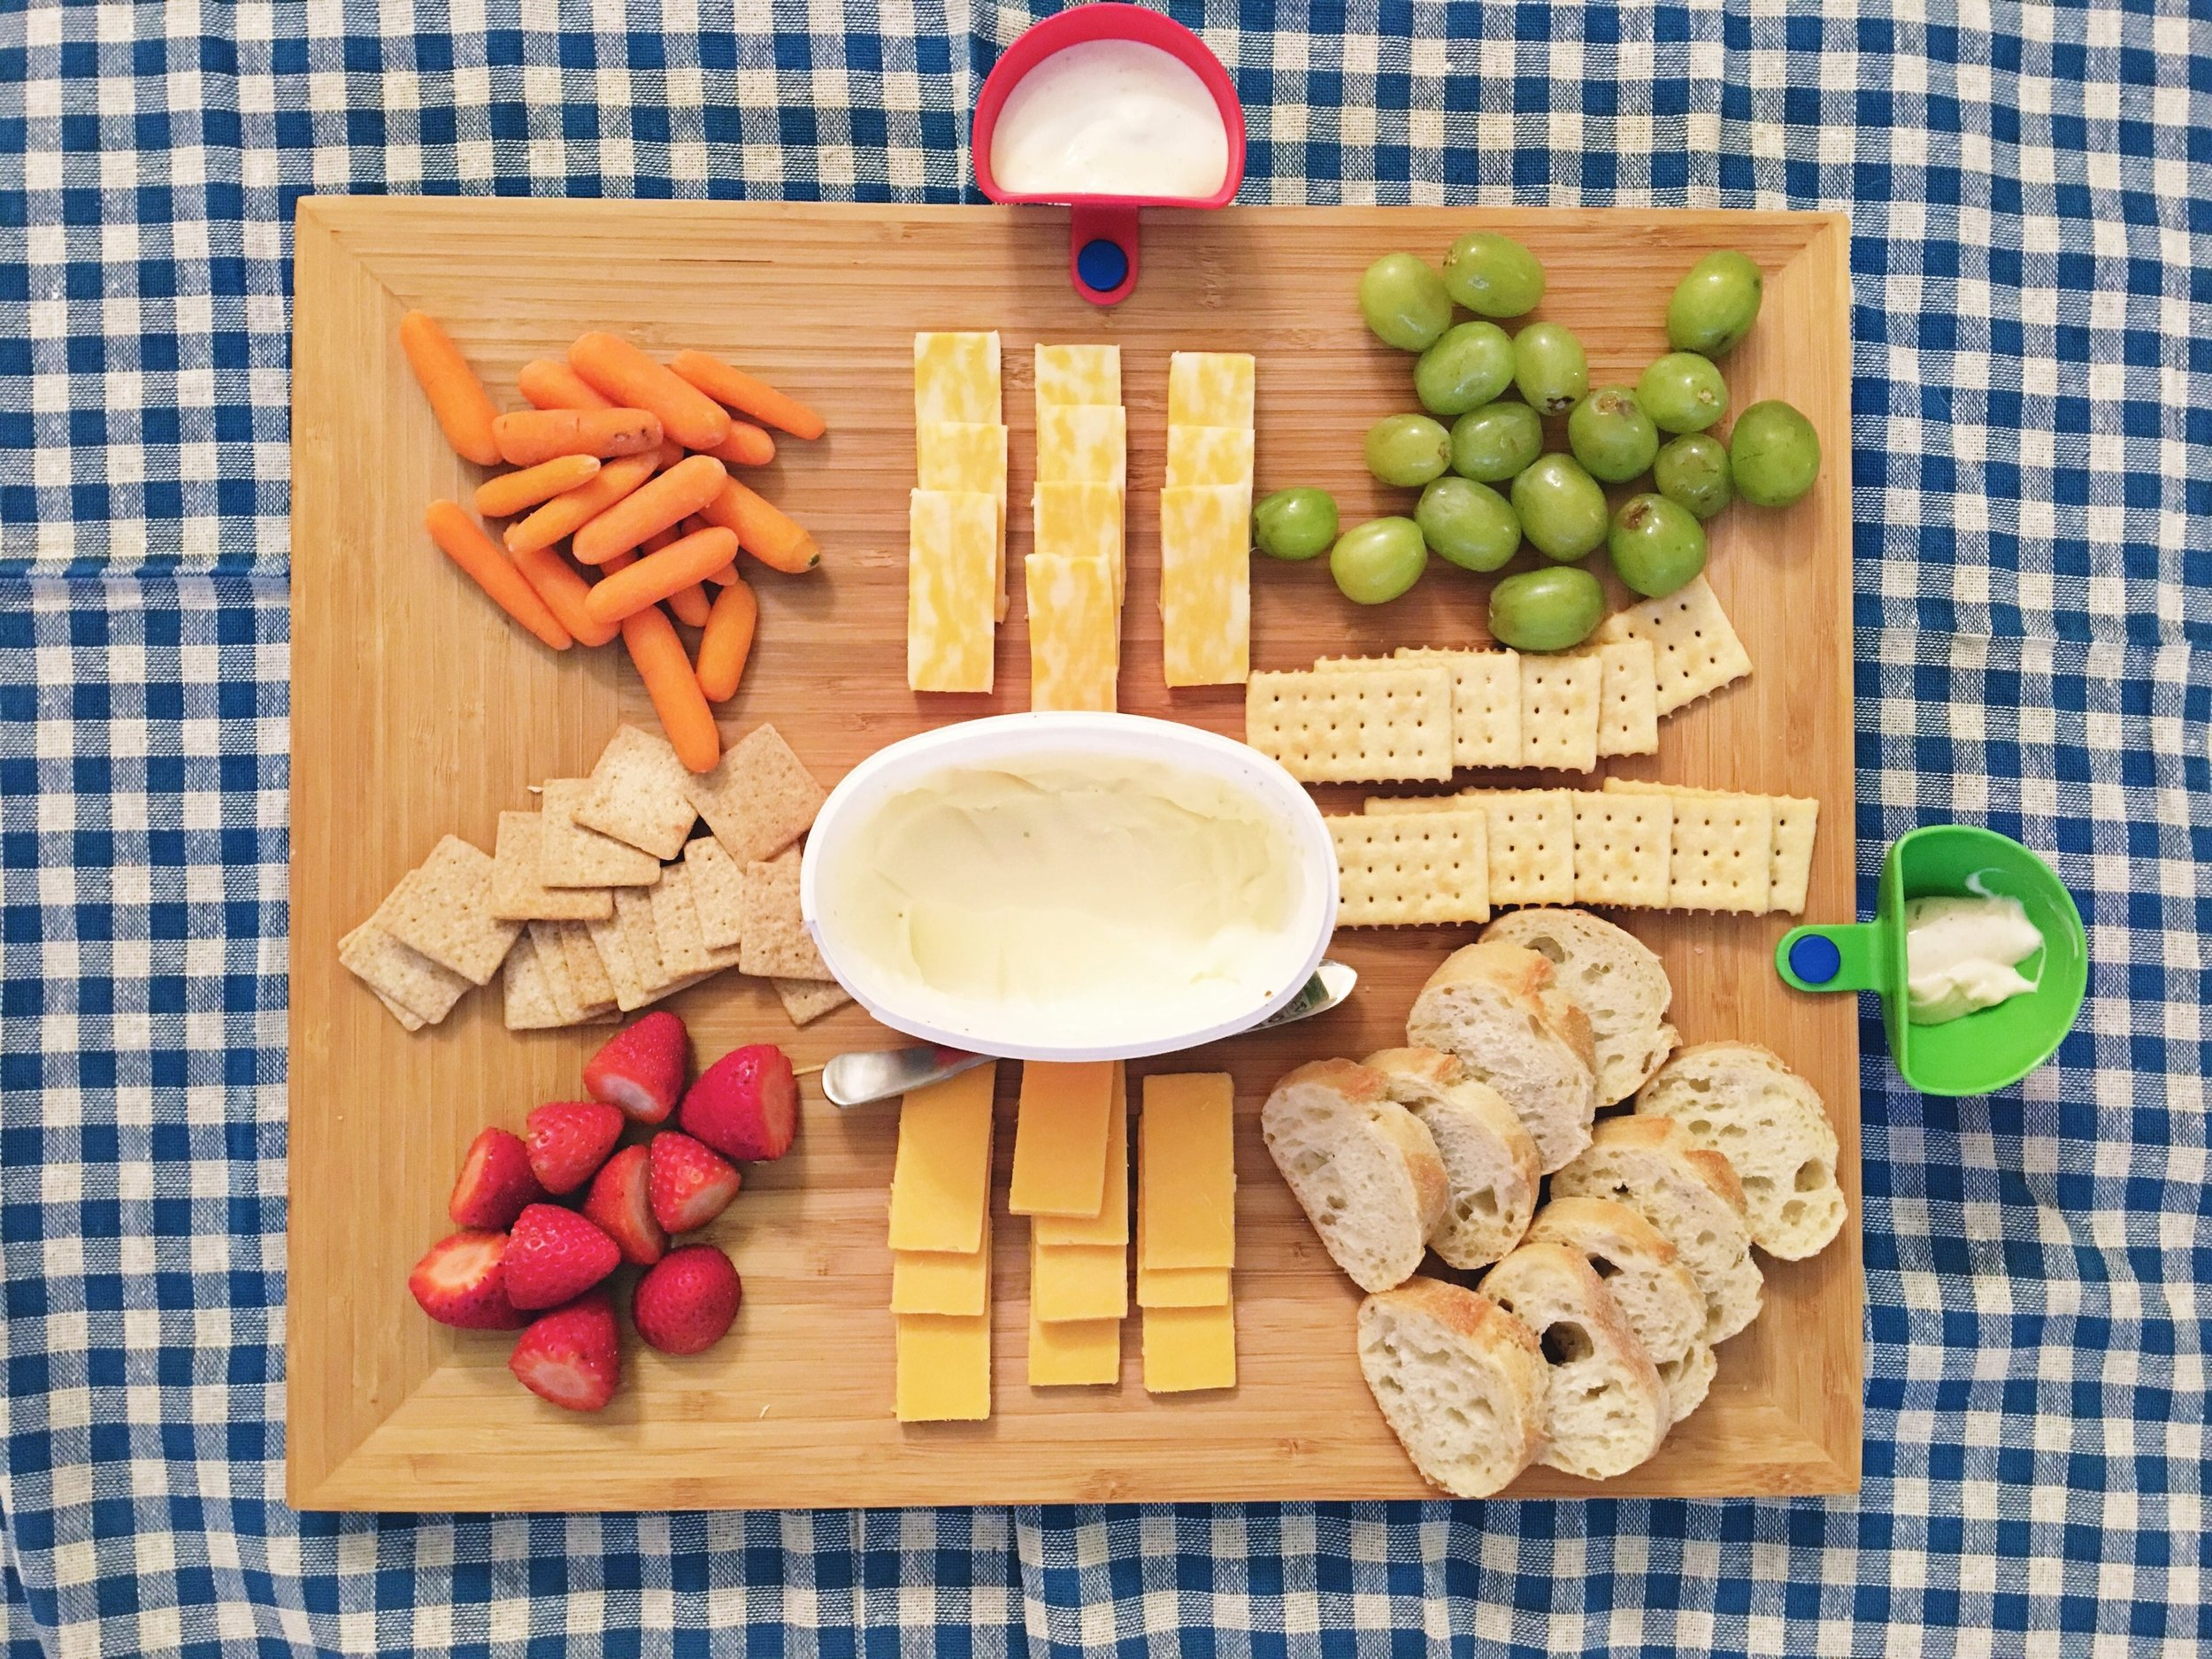 lunch ideas for nursing moms